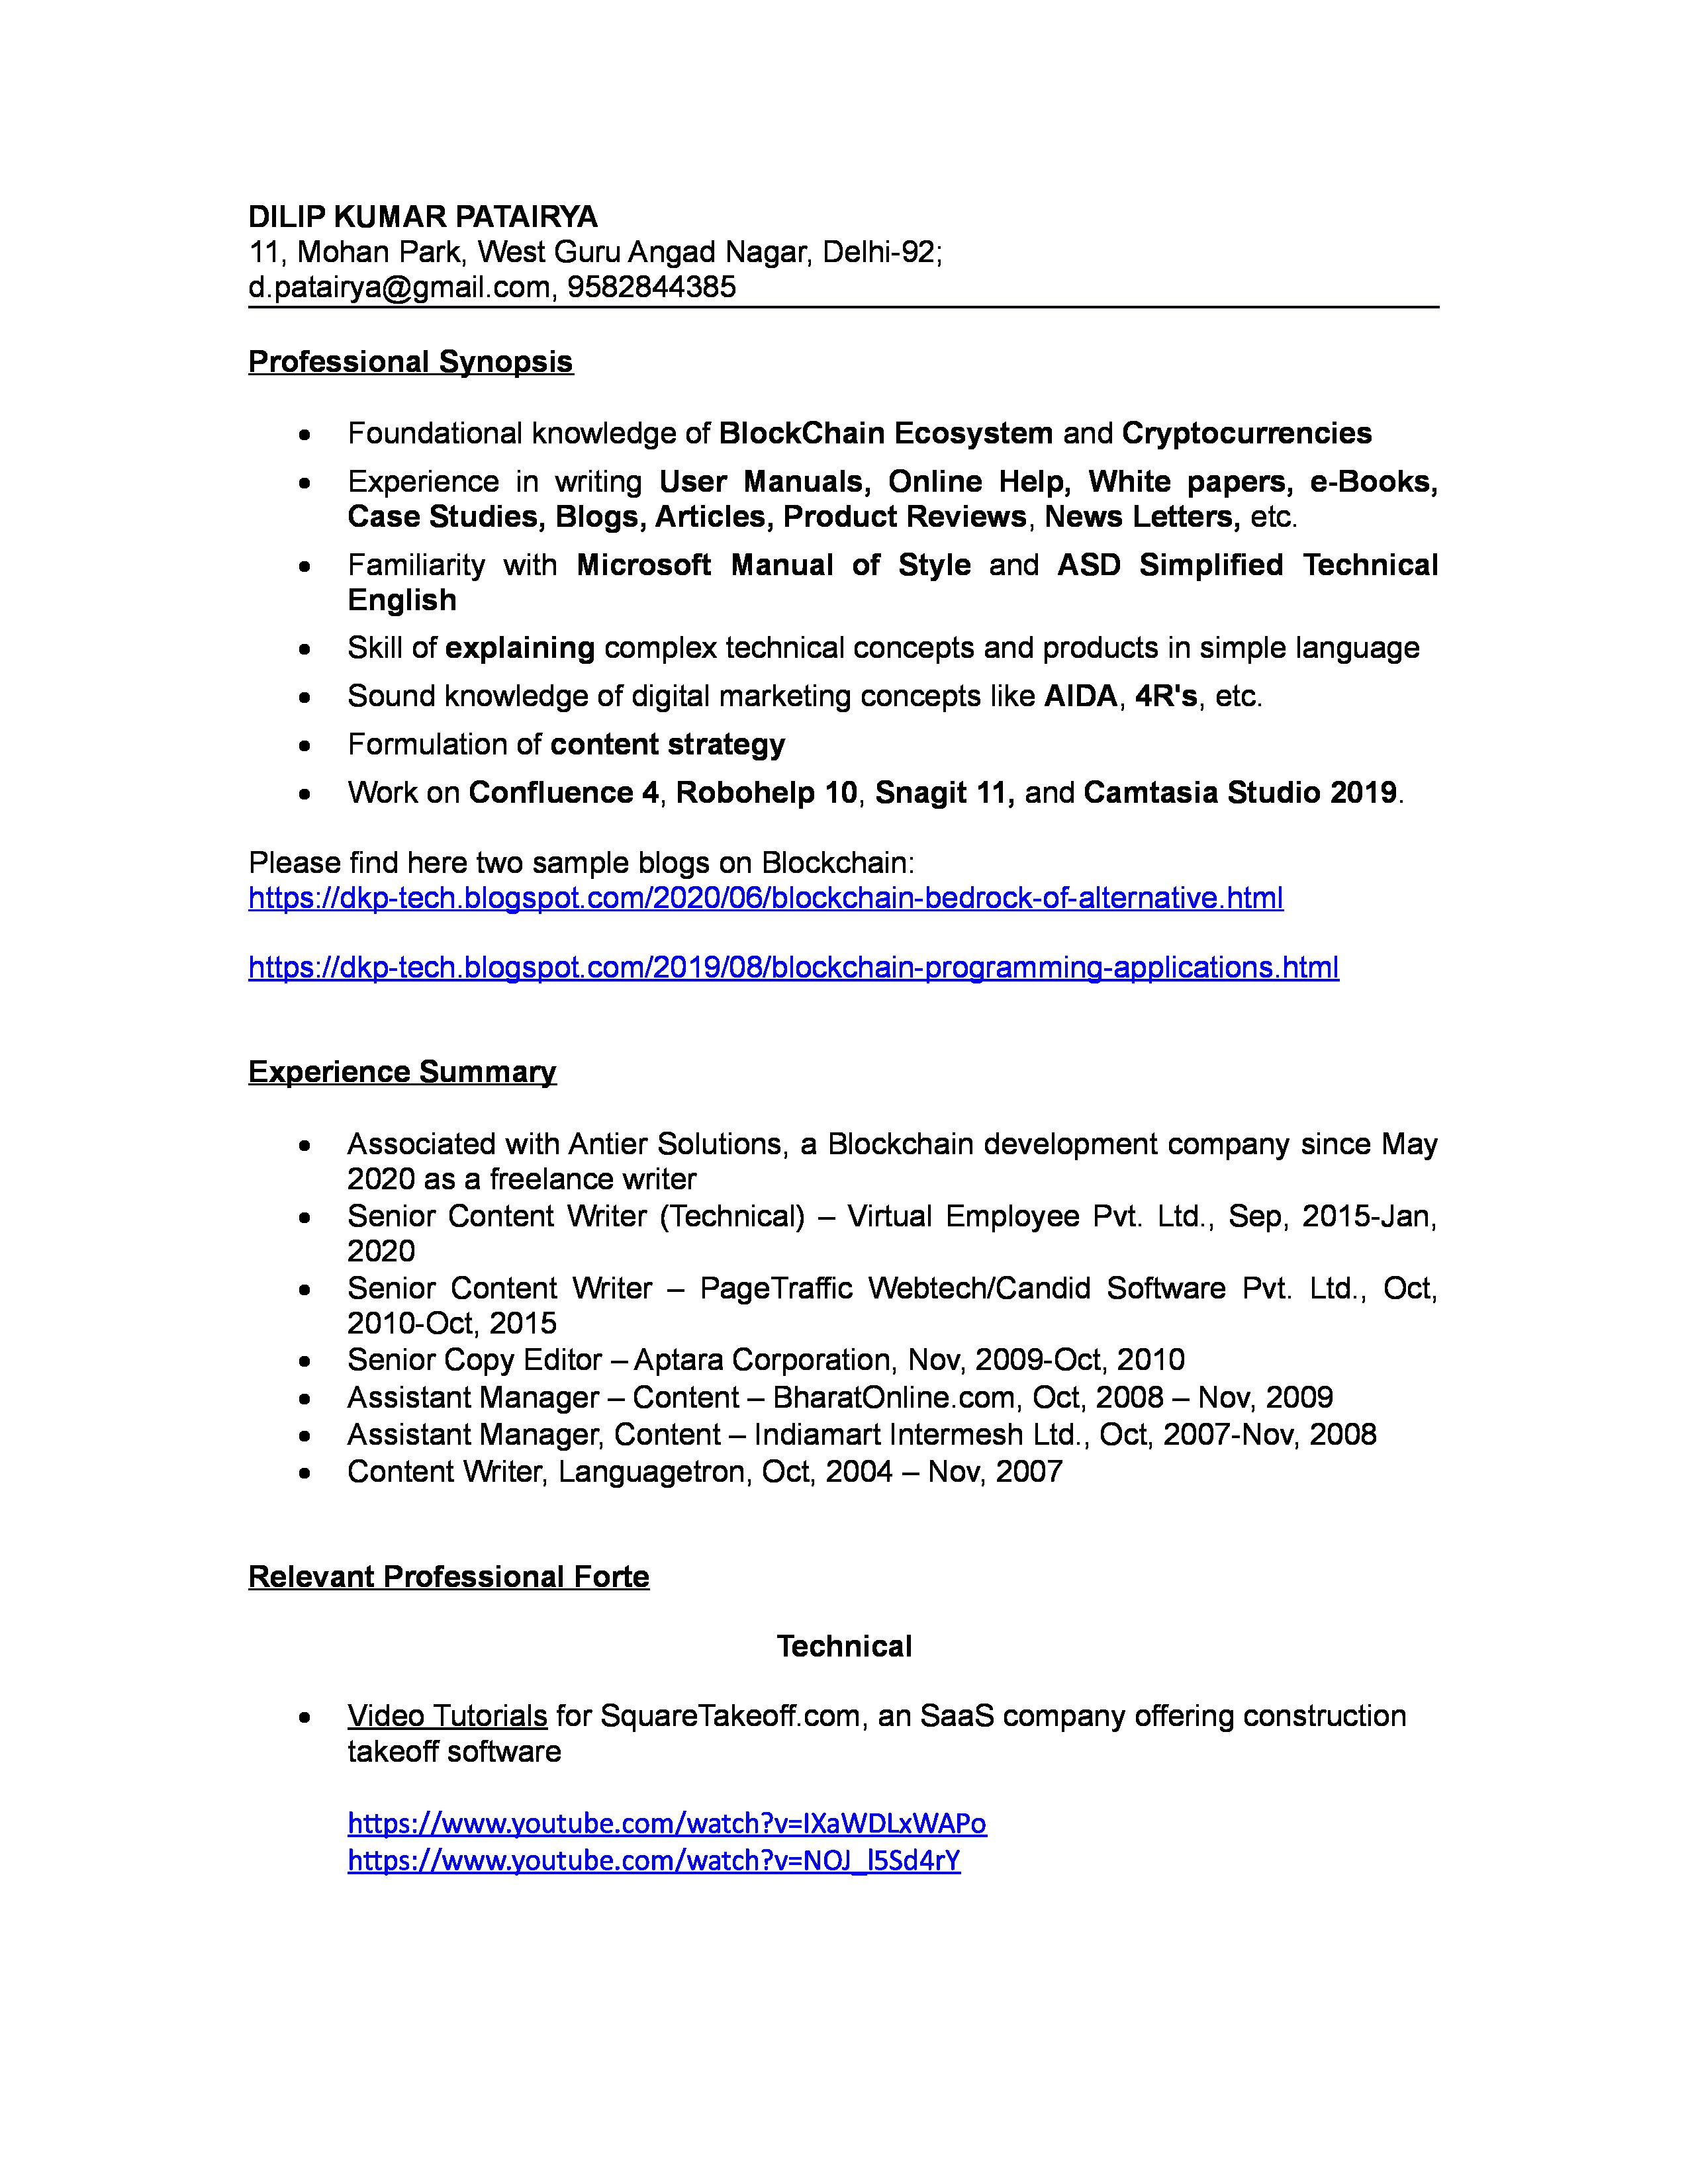 dilip-nimbus-resume2-page-0